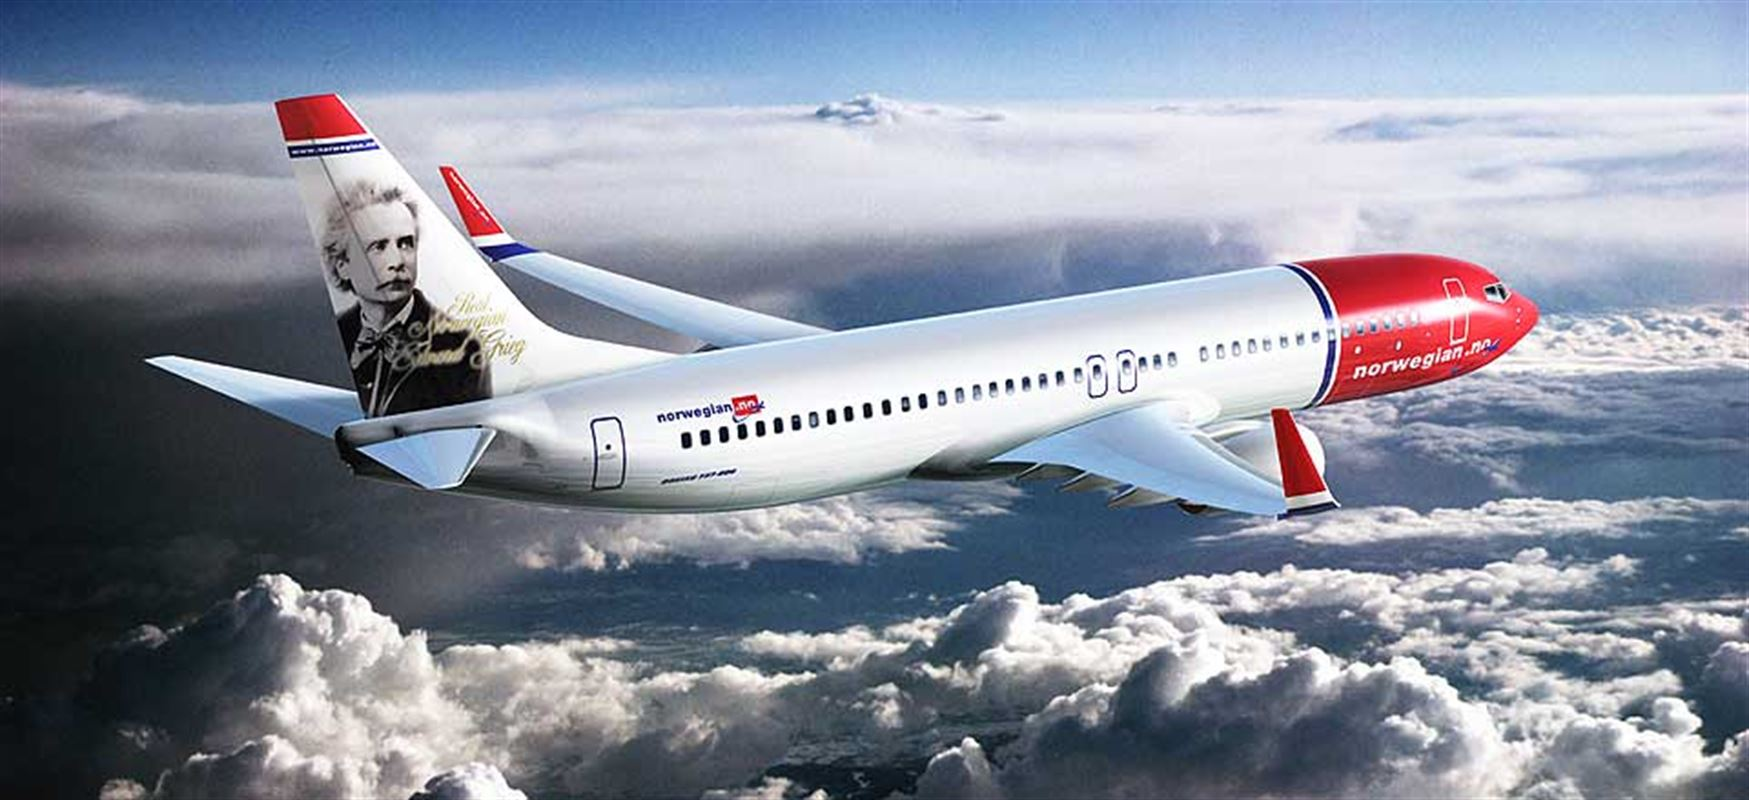 Classifica compagnie aeree low cost